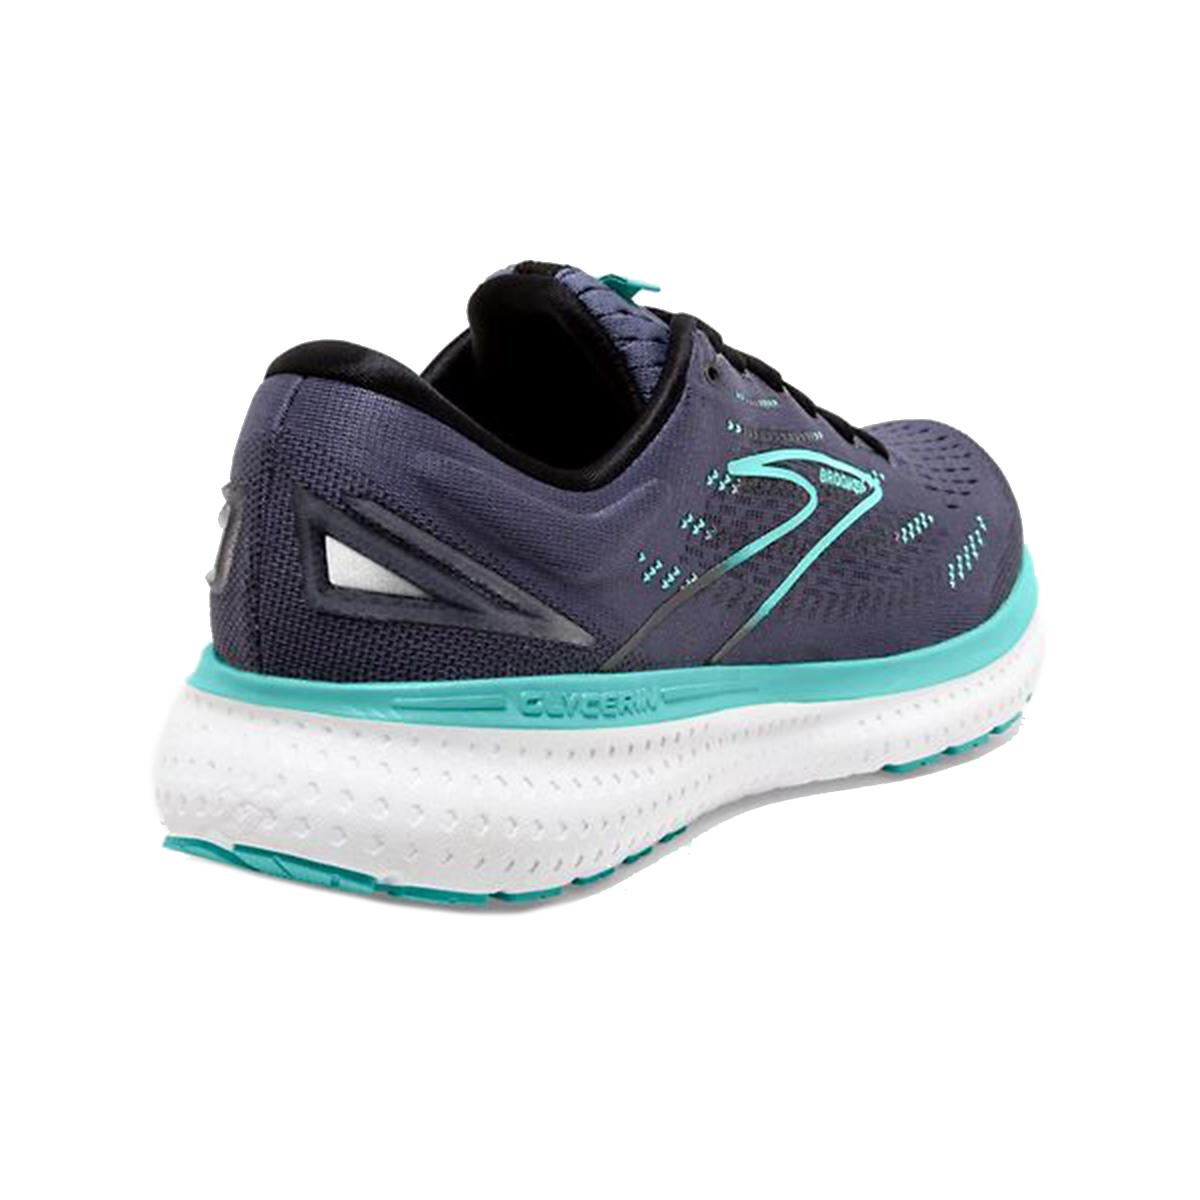 Women's Brooks Glycerin 19 Running Shoe - Color: Nightshadow/Bla - Size: 5 - Width: Regular, Nightshadow/Bla, large, image 4